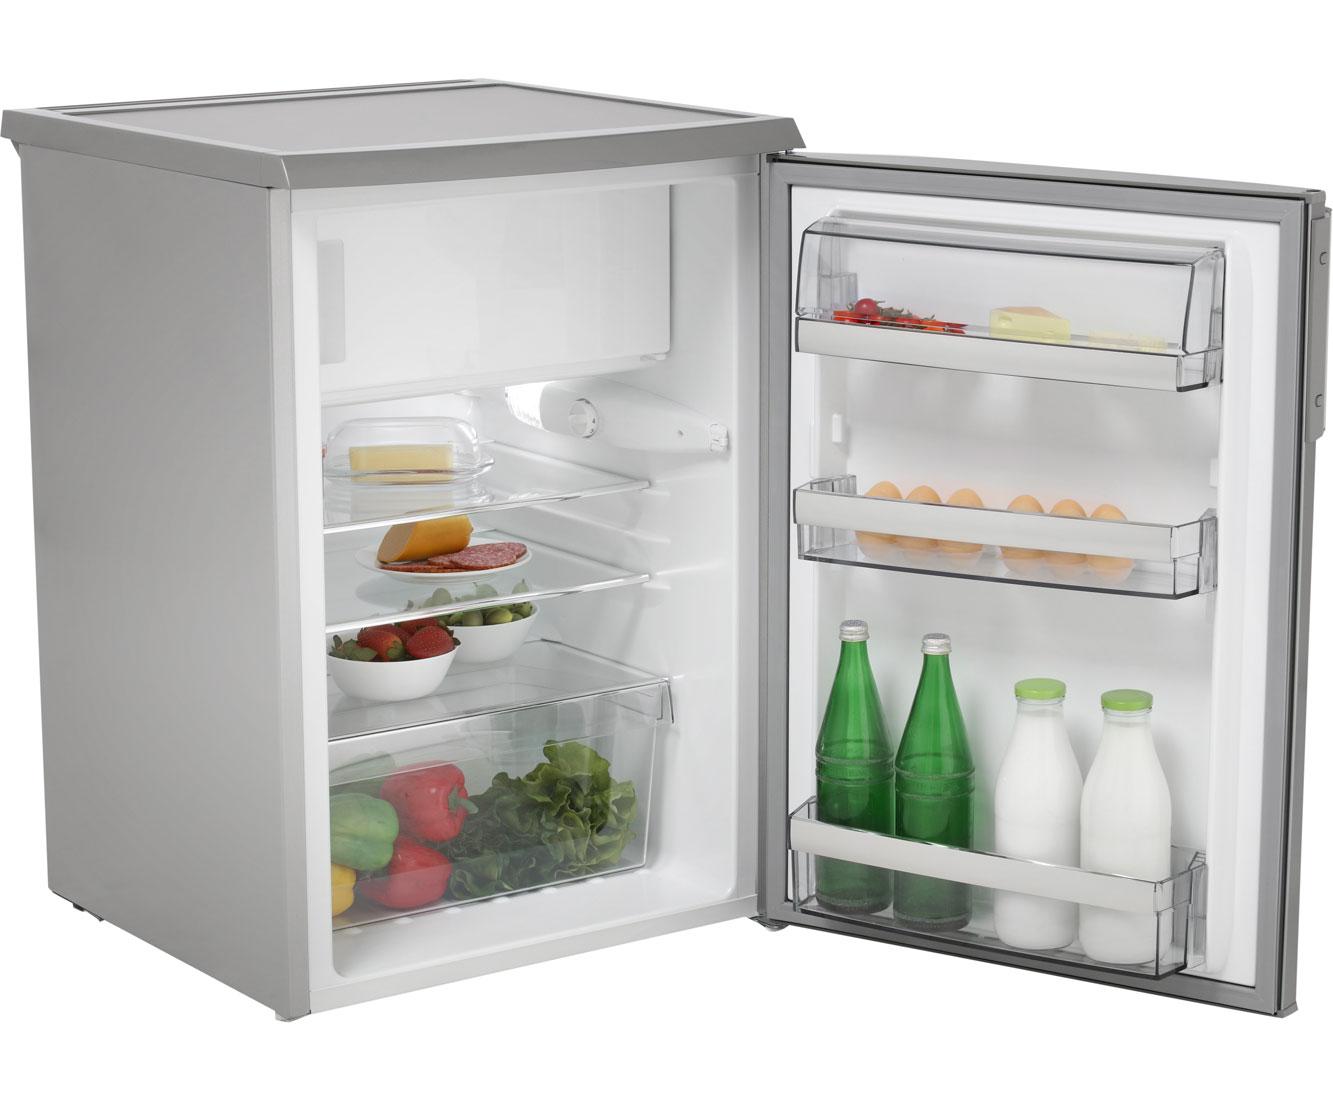 Aeg Kühlschrank Idealo : Aeg santo rtb81421ax kühlschrank mit gefrierfach edelstahl a